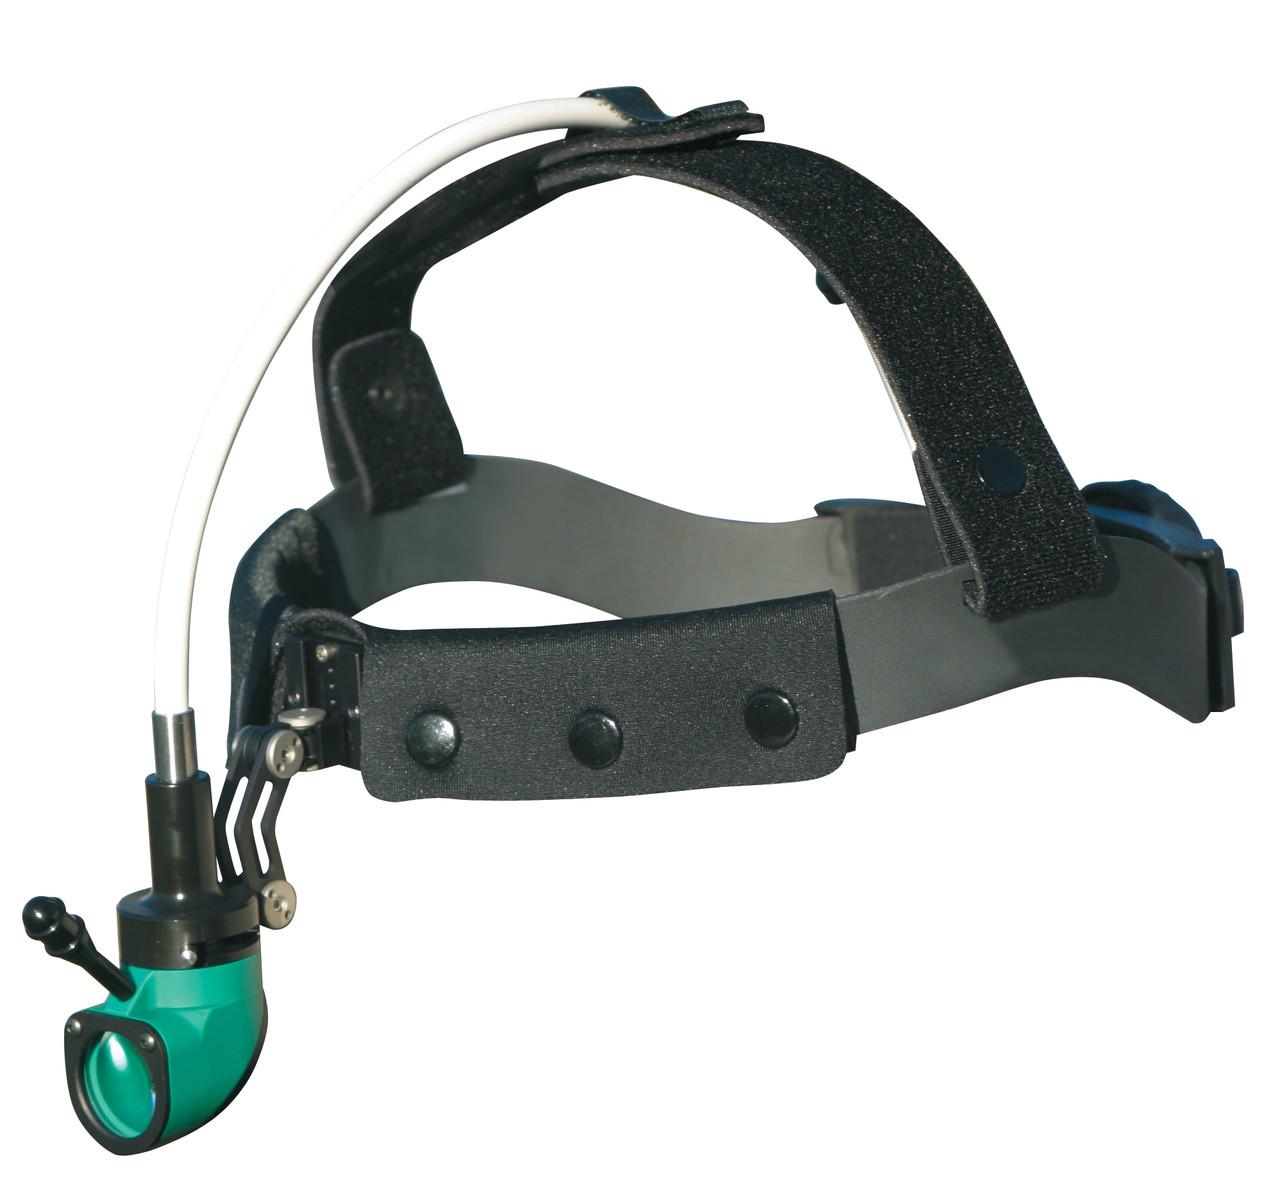 Burton XenaLux Surgical Headlight System